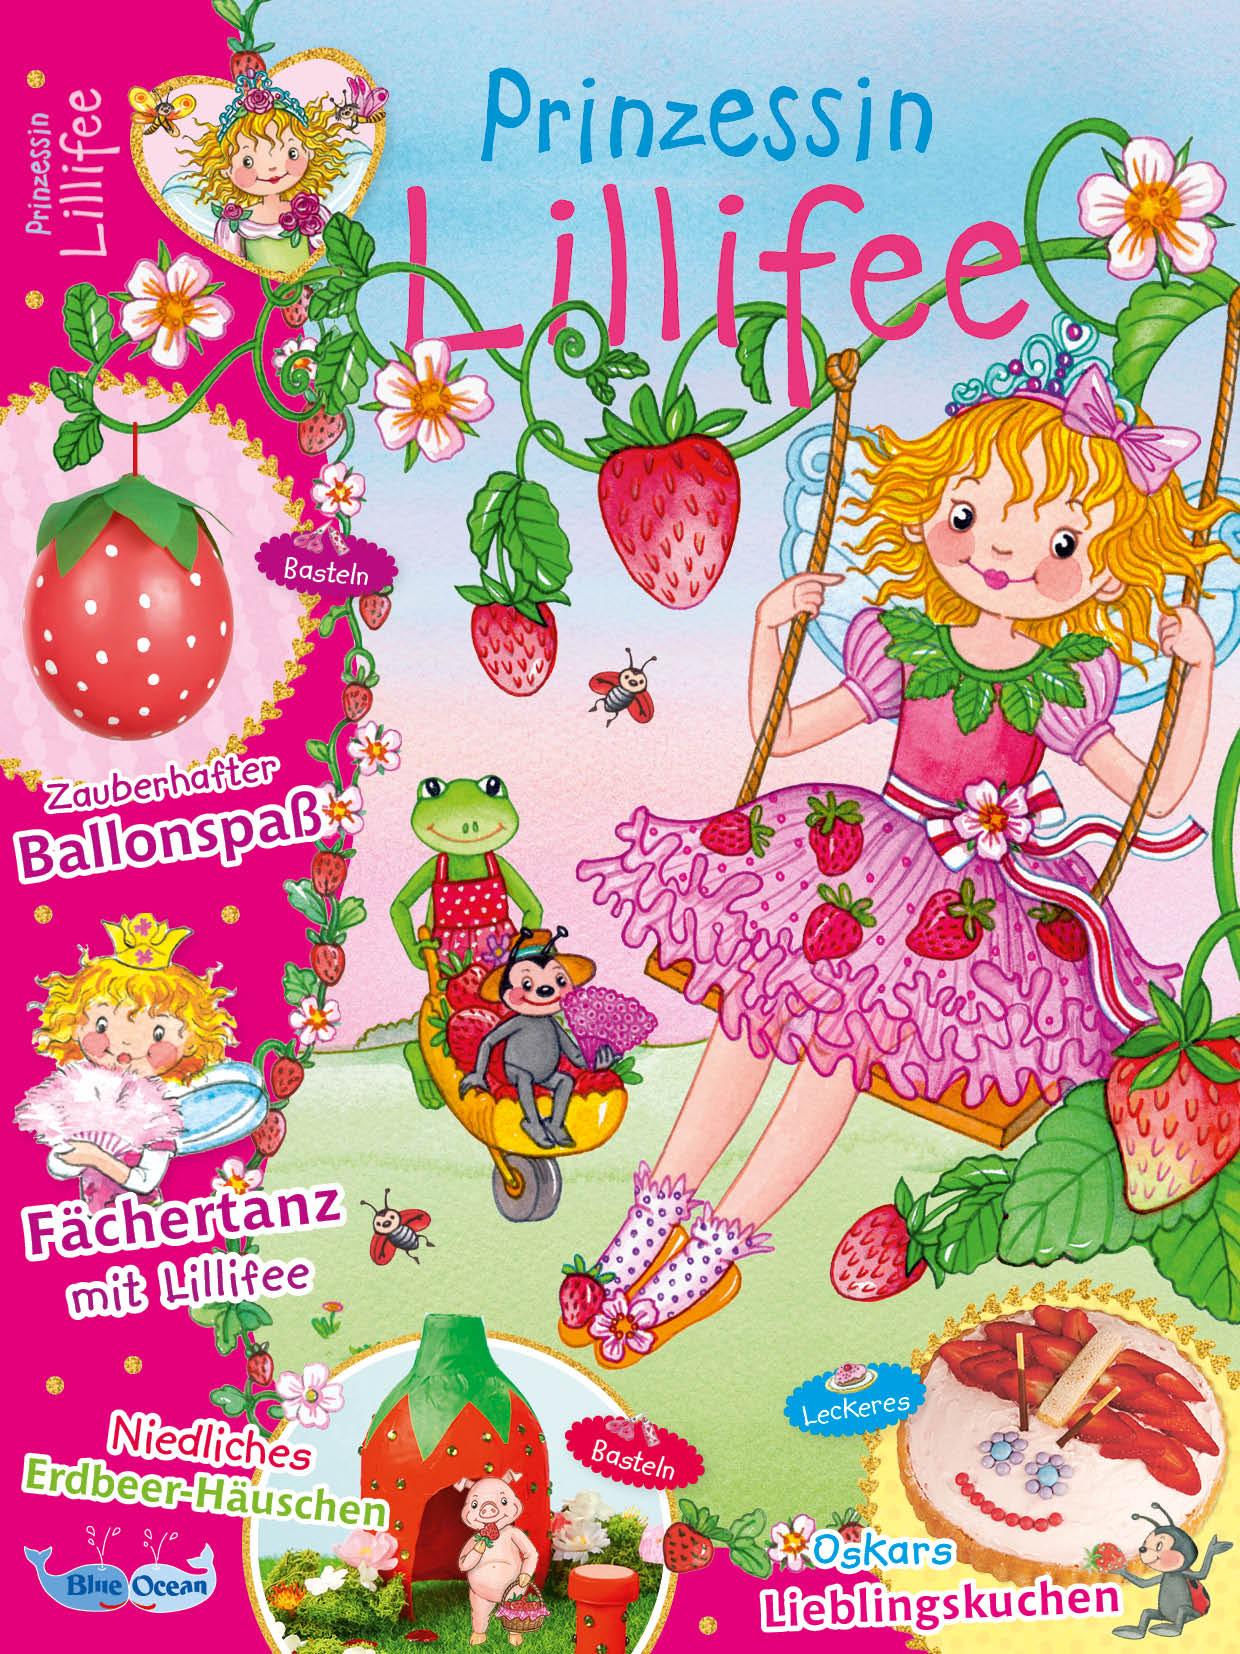 Prinzessin Lillifee 062019